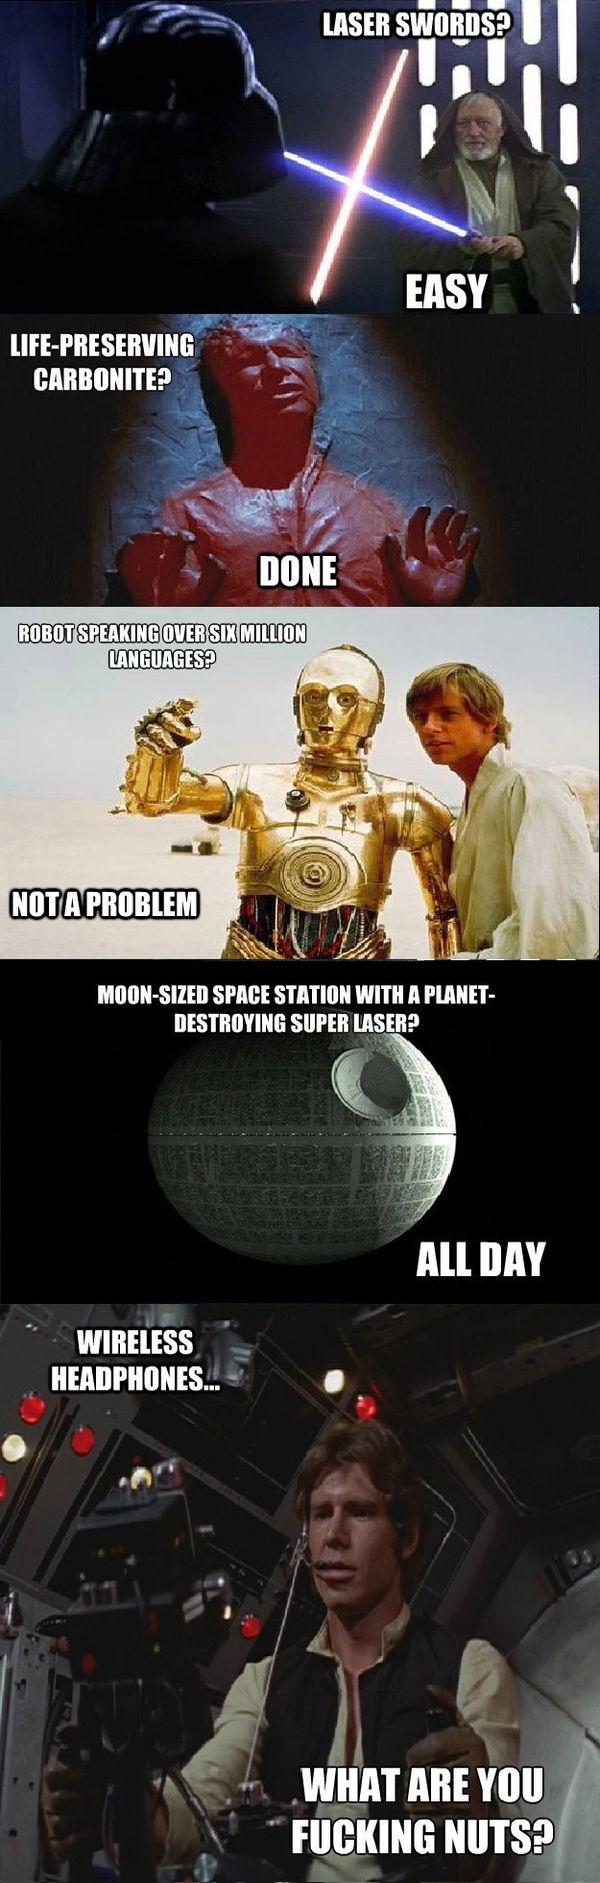 star-wars-logic-laser-easy-wireless-headphones-funny-meme.jpg